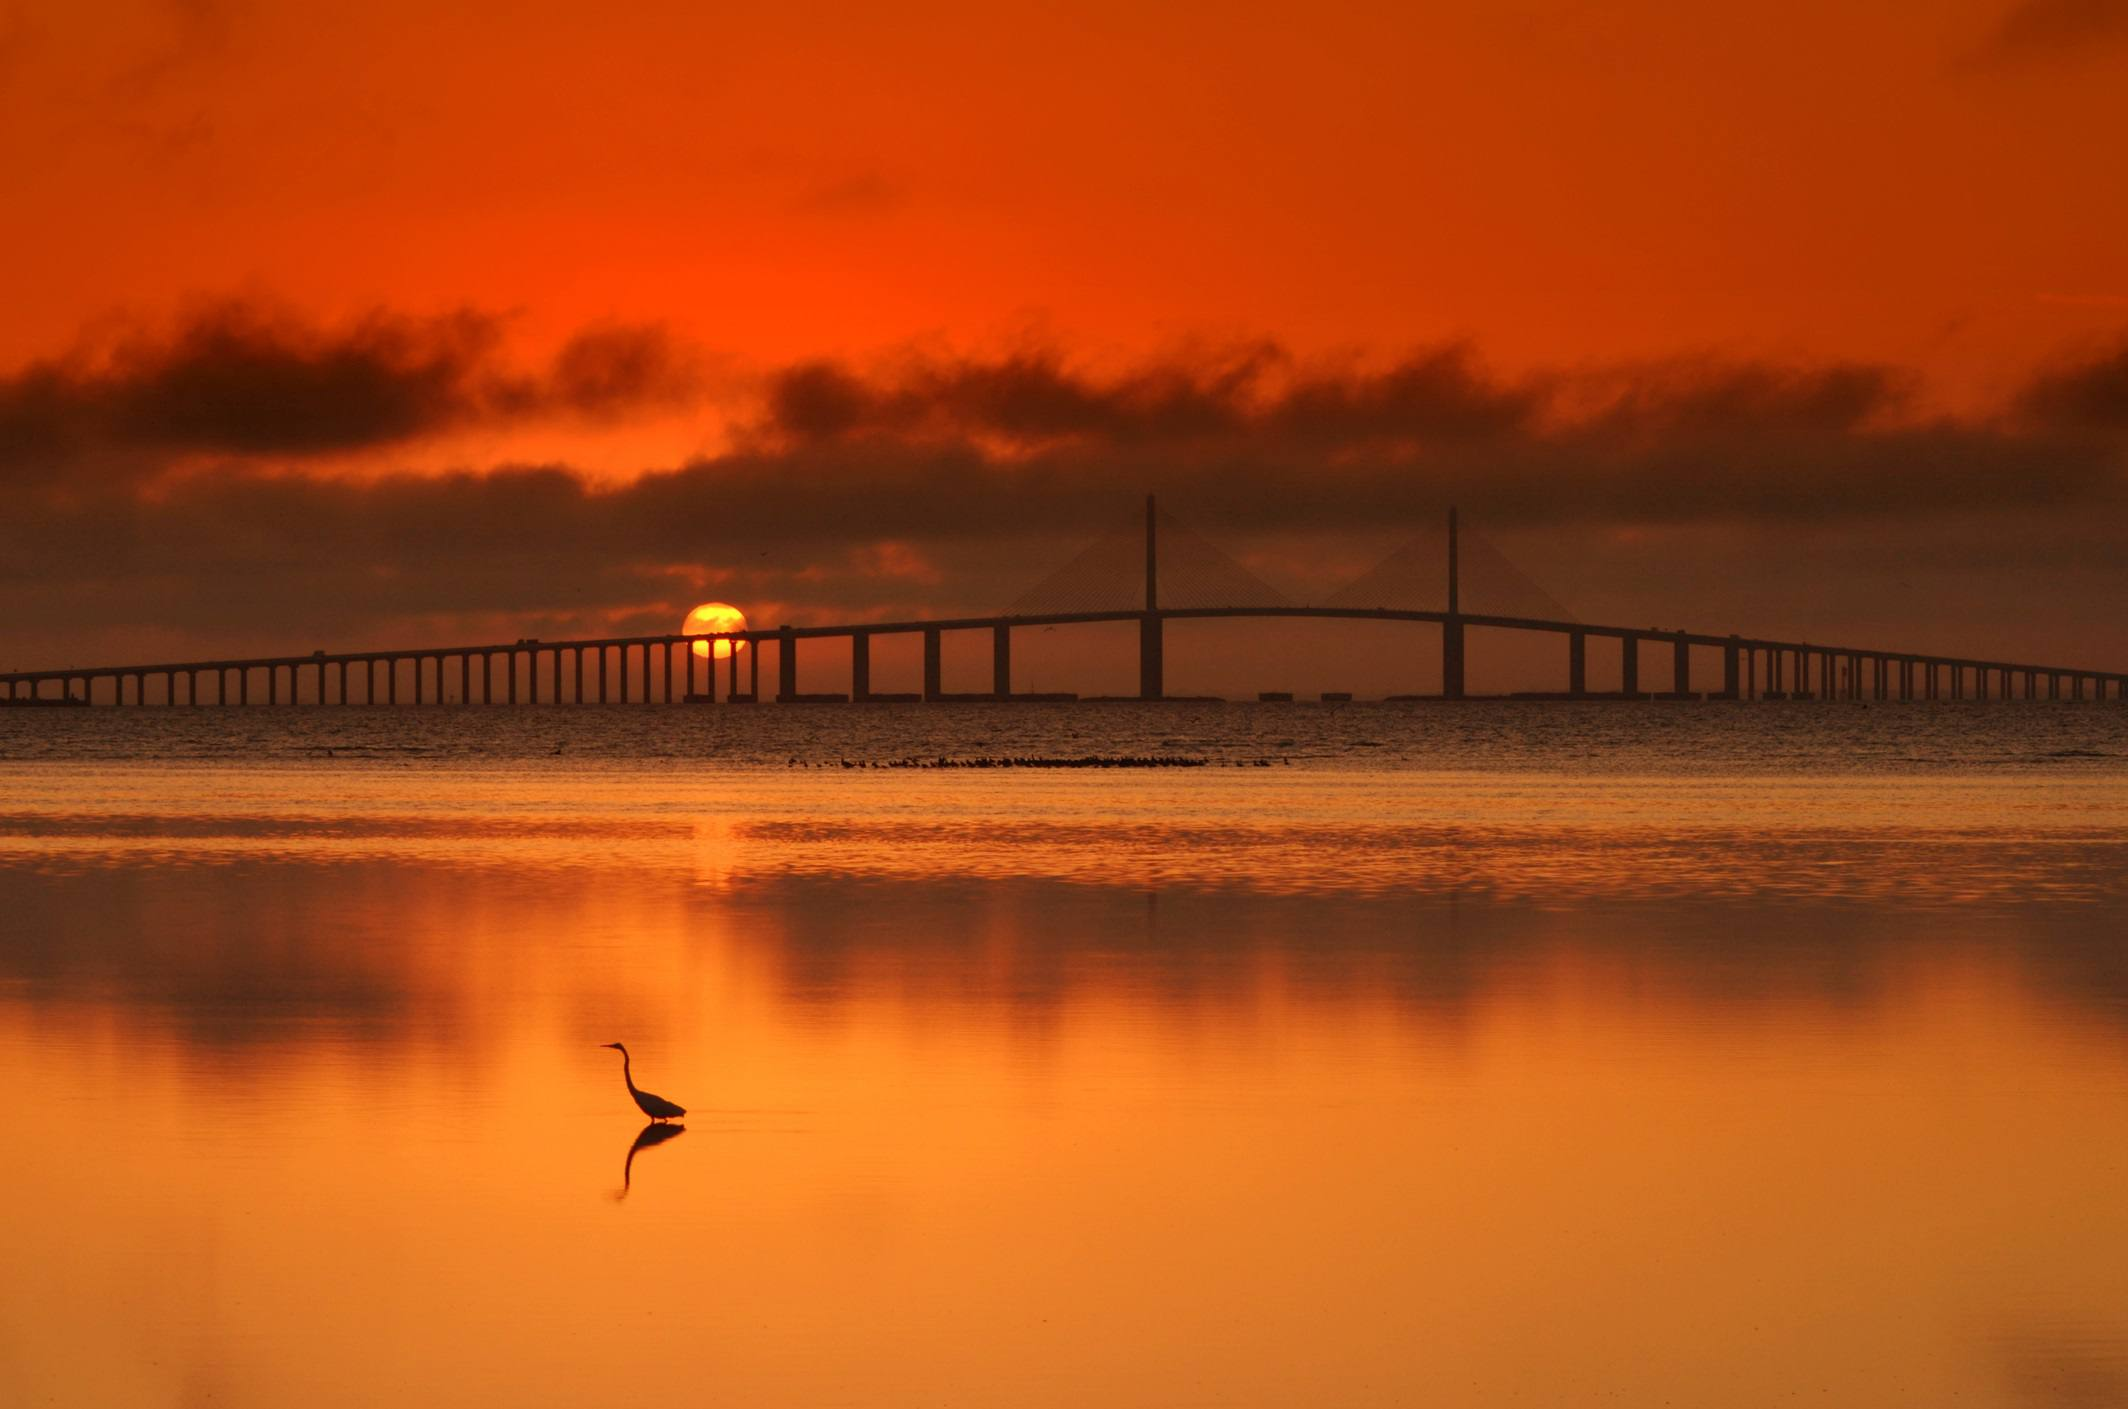 View of Skyway bridge at sunrise, Florida.